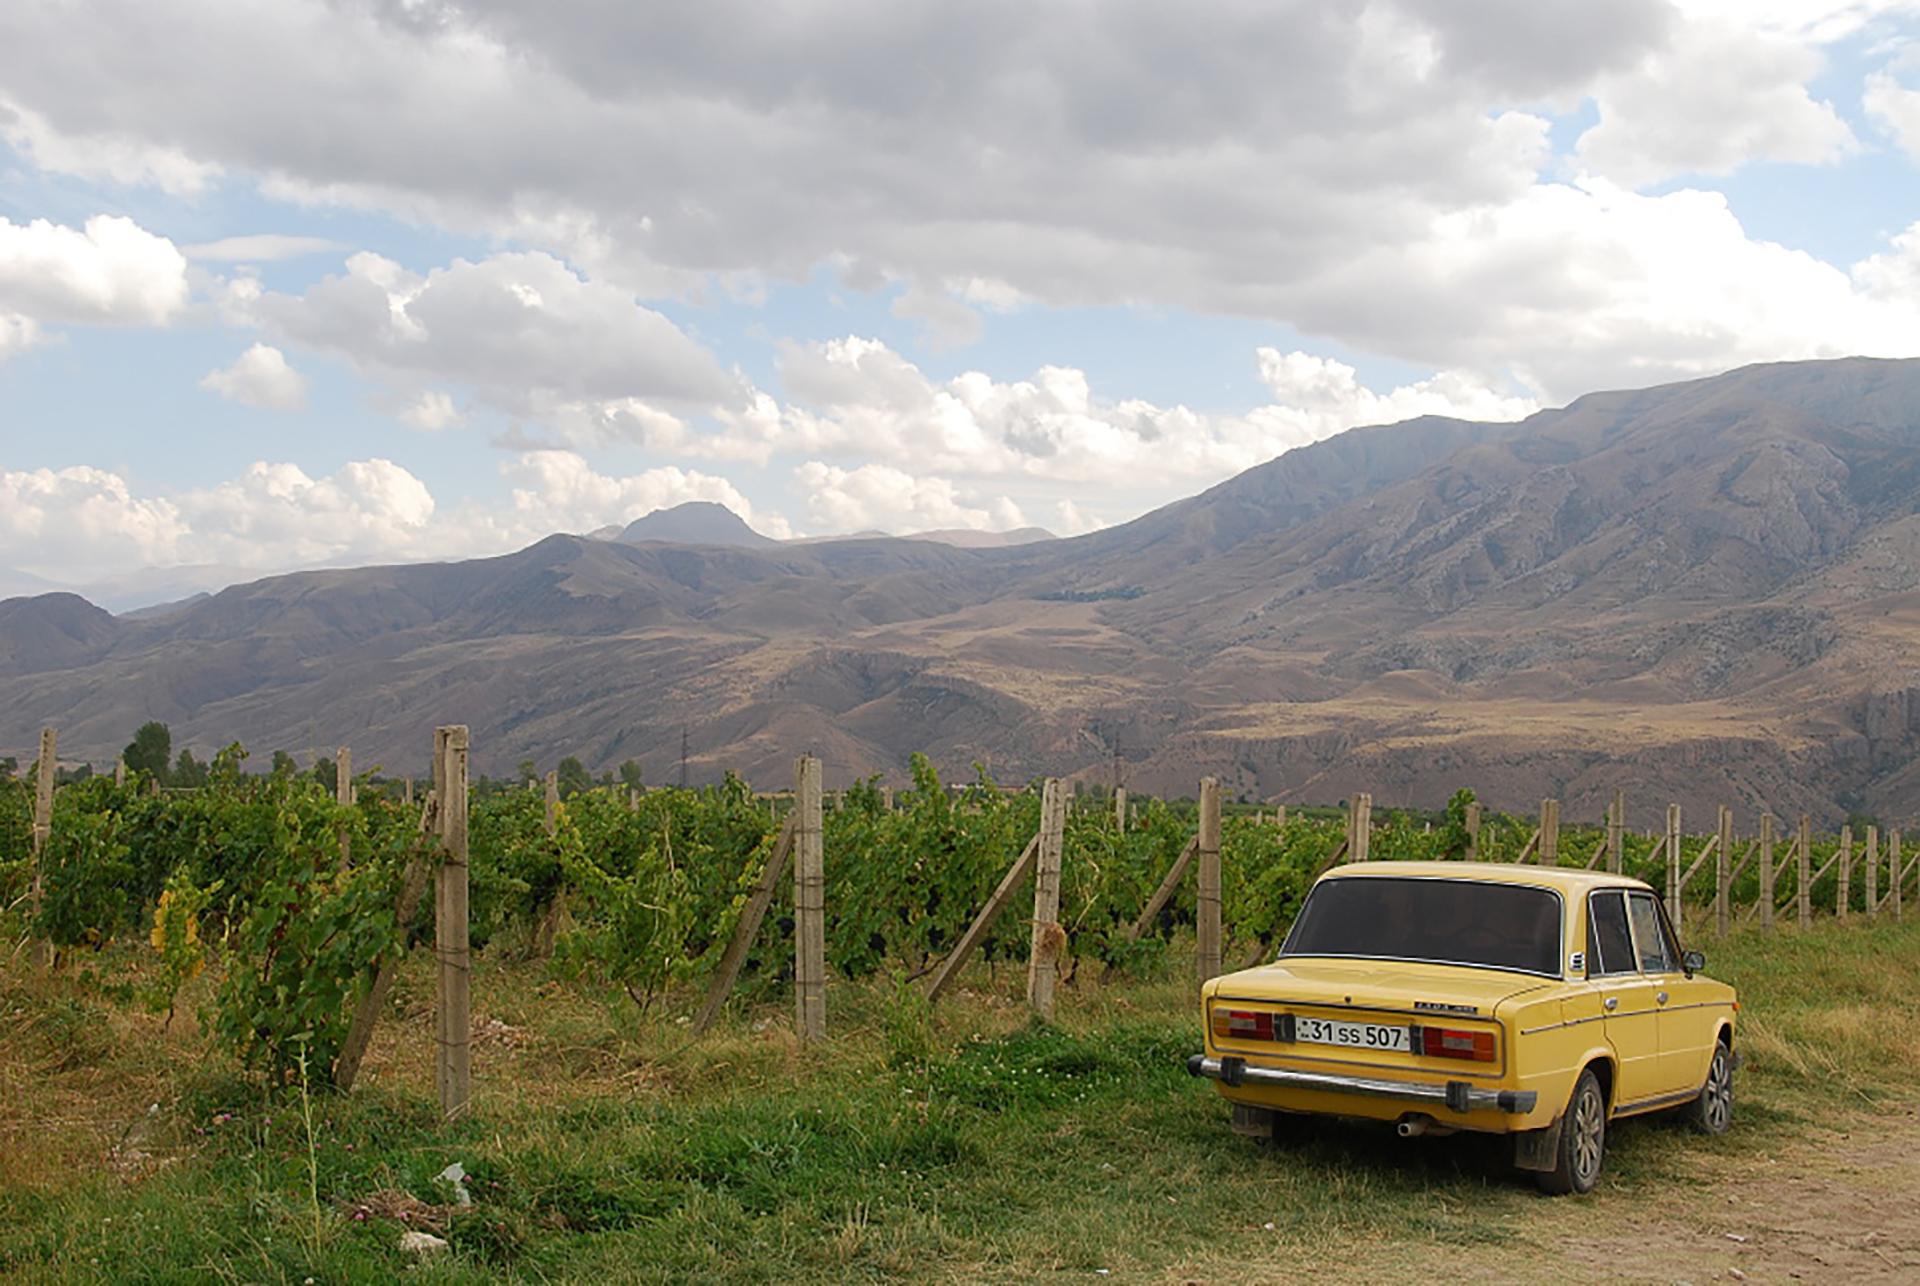 Vigne in provincia di Vayots Dzor